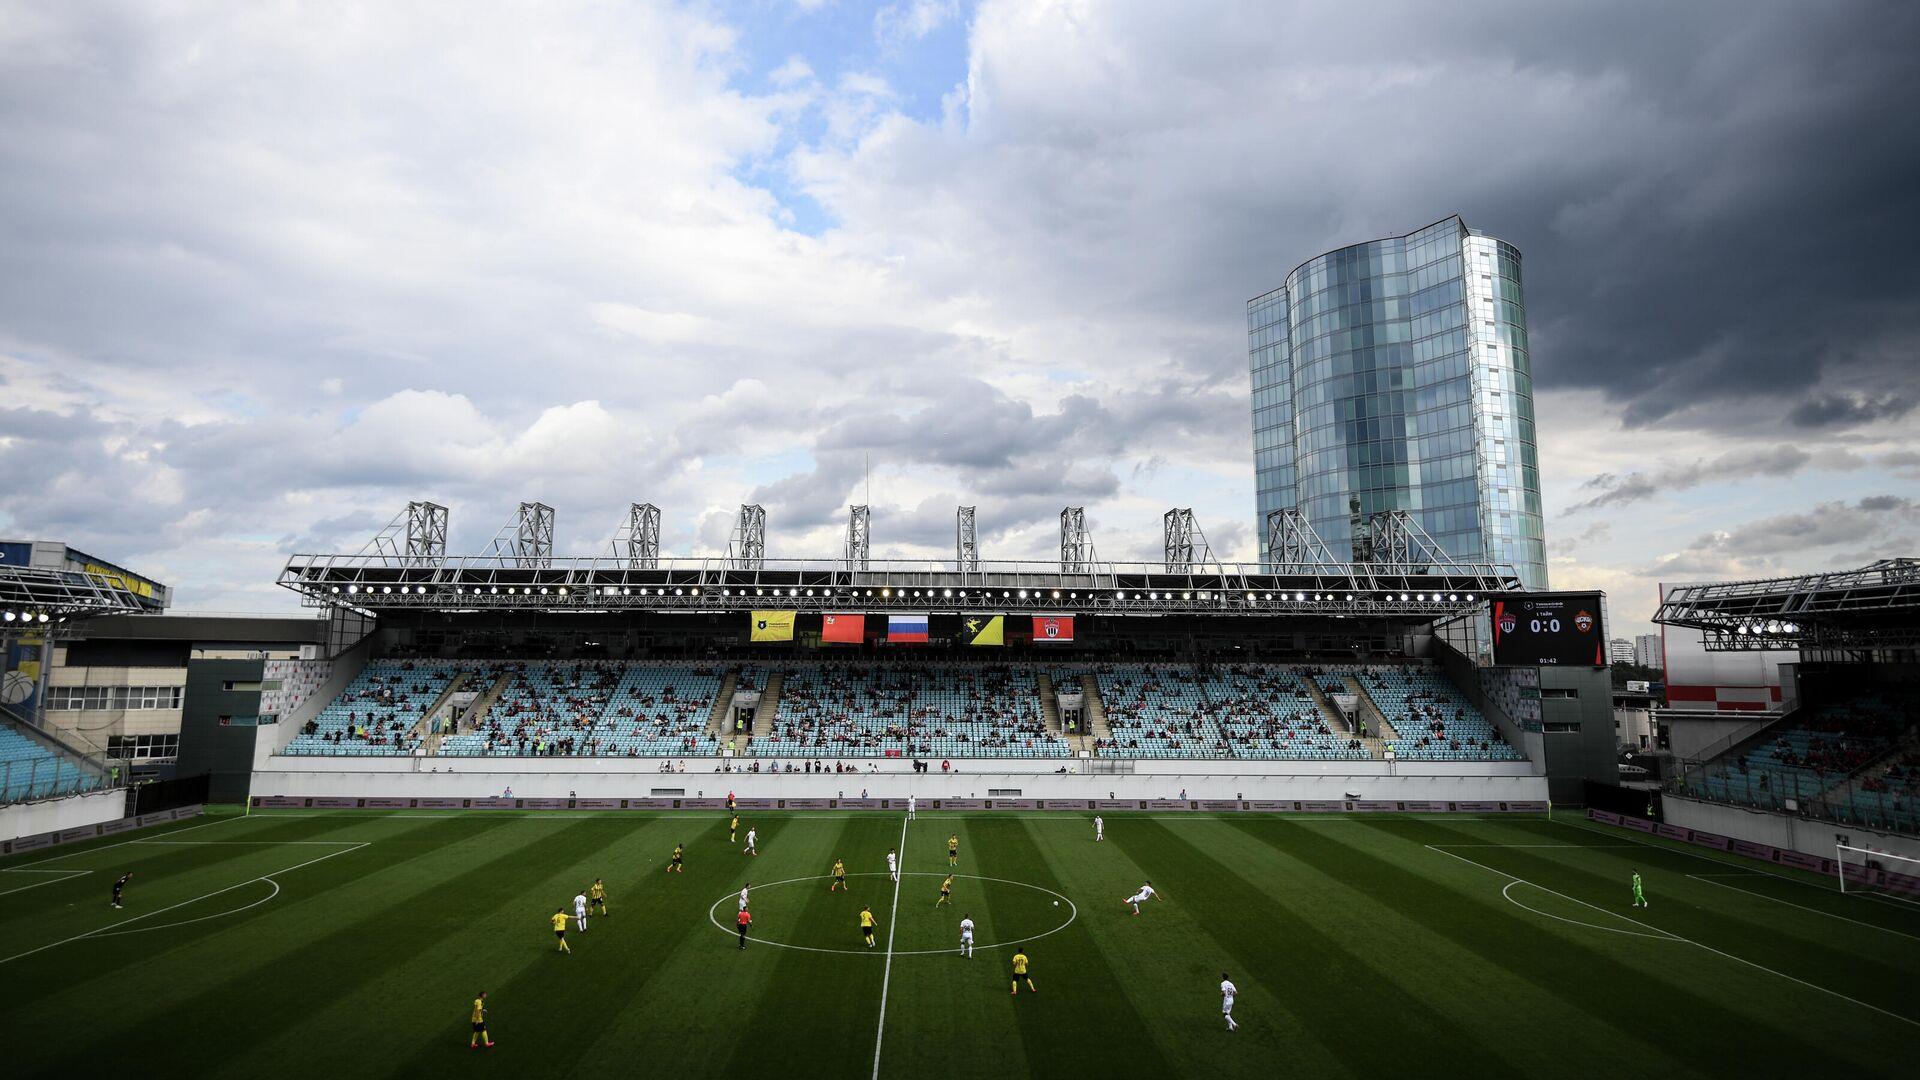 Игроки на поле стадиона Арена Химки - РИА Новости, 1920, 16.09.2021